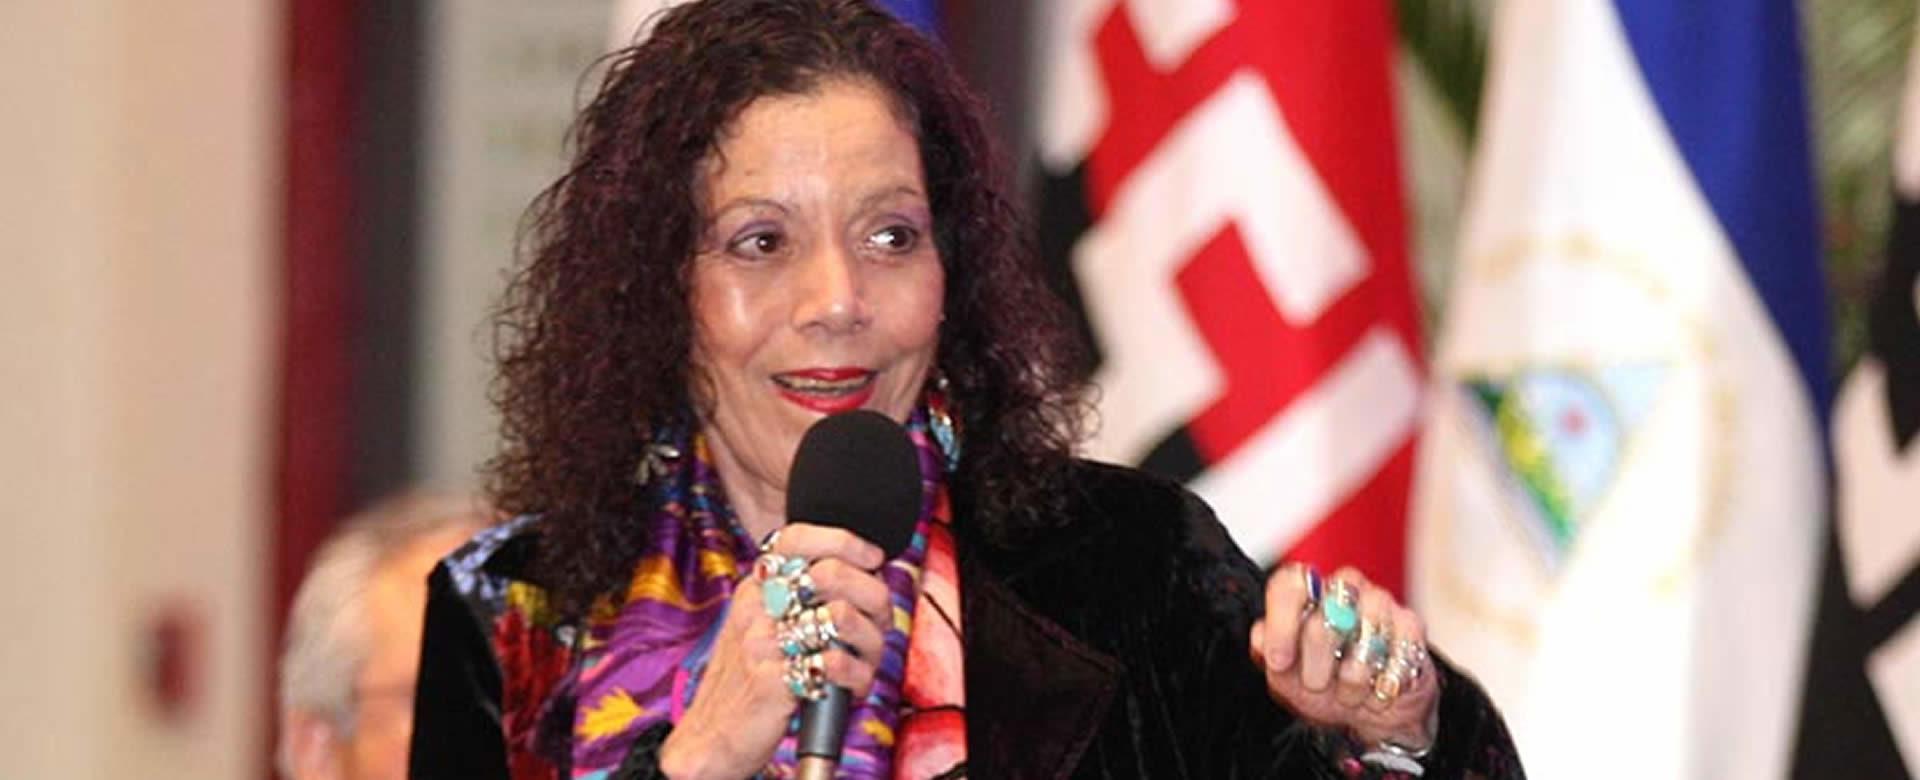 Rosario: Seguimos abiertos a un camino de entendimiento entre nicaragüenses